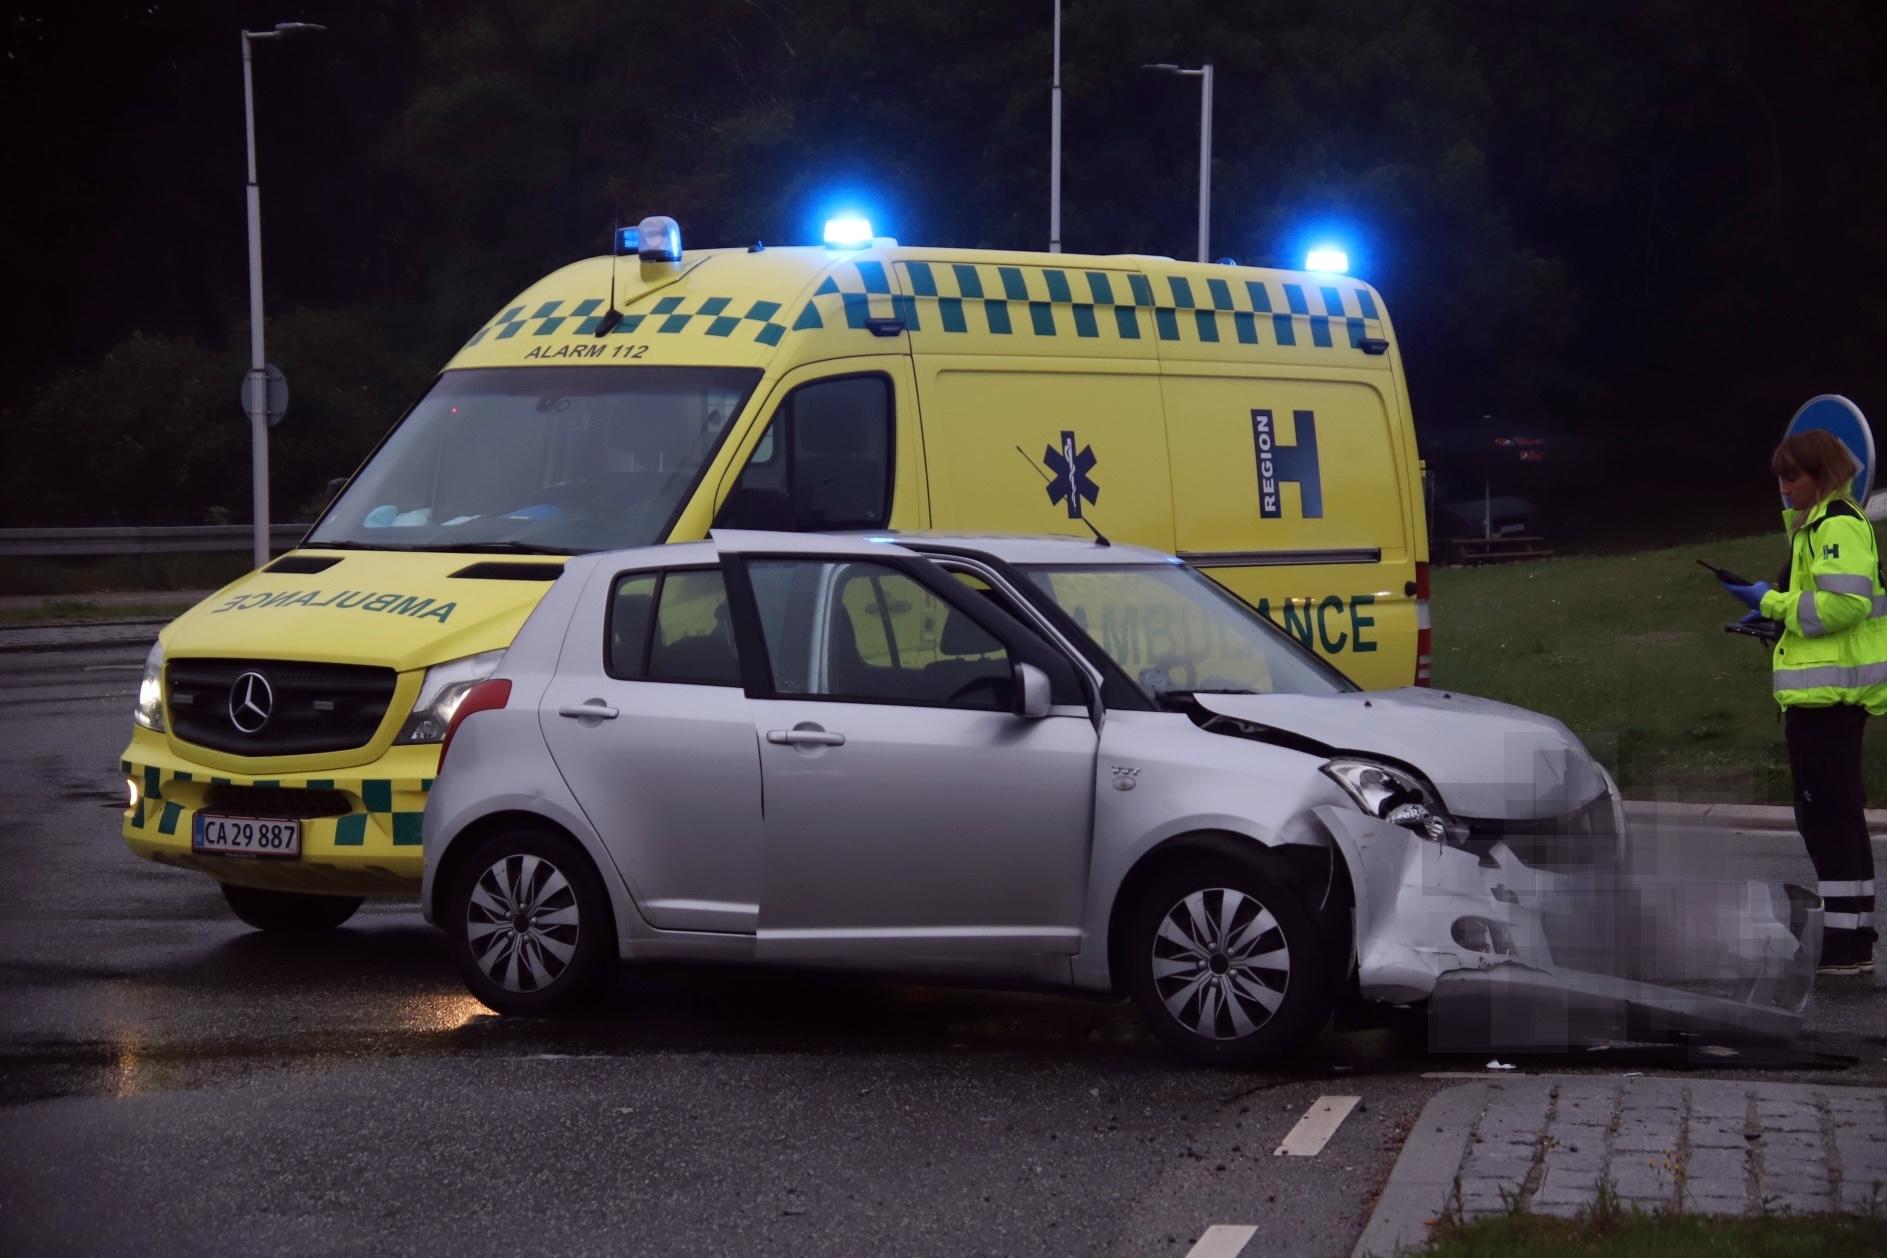 Trafikulykke i rundkørsel - redning på stedet